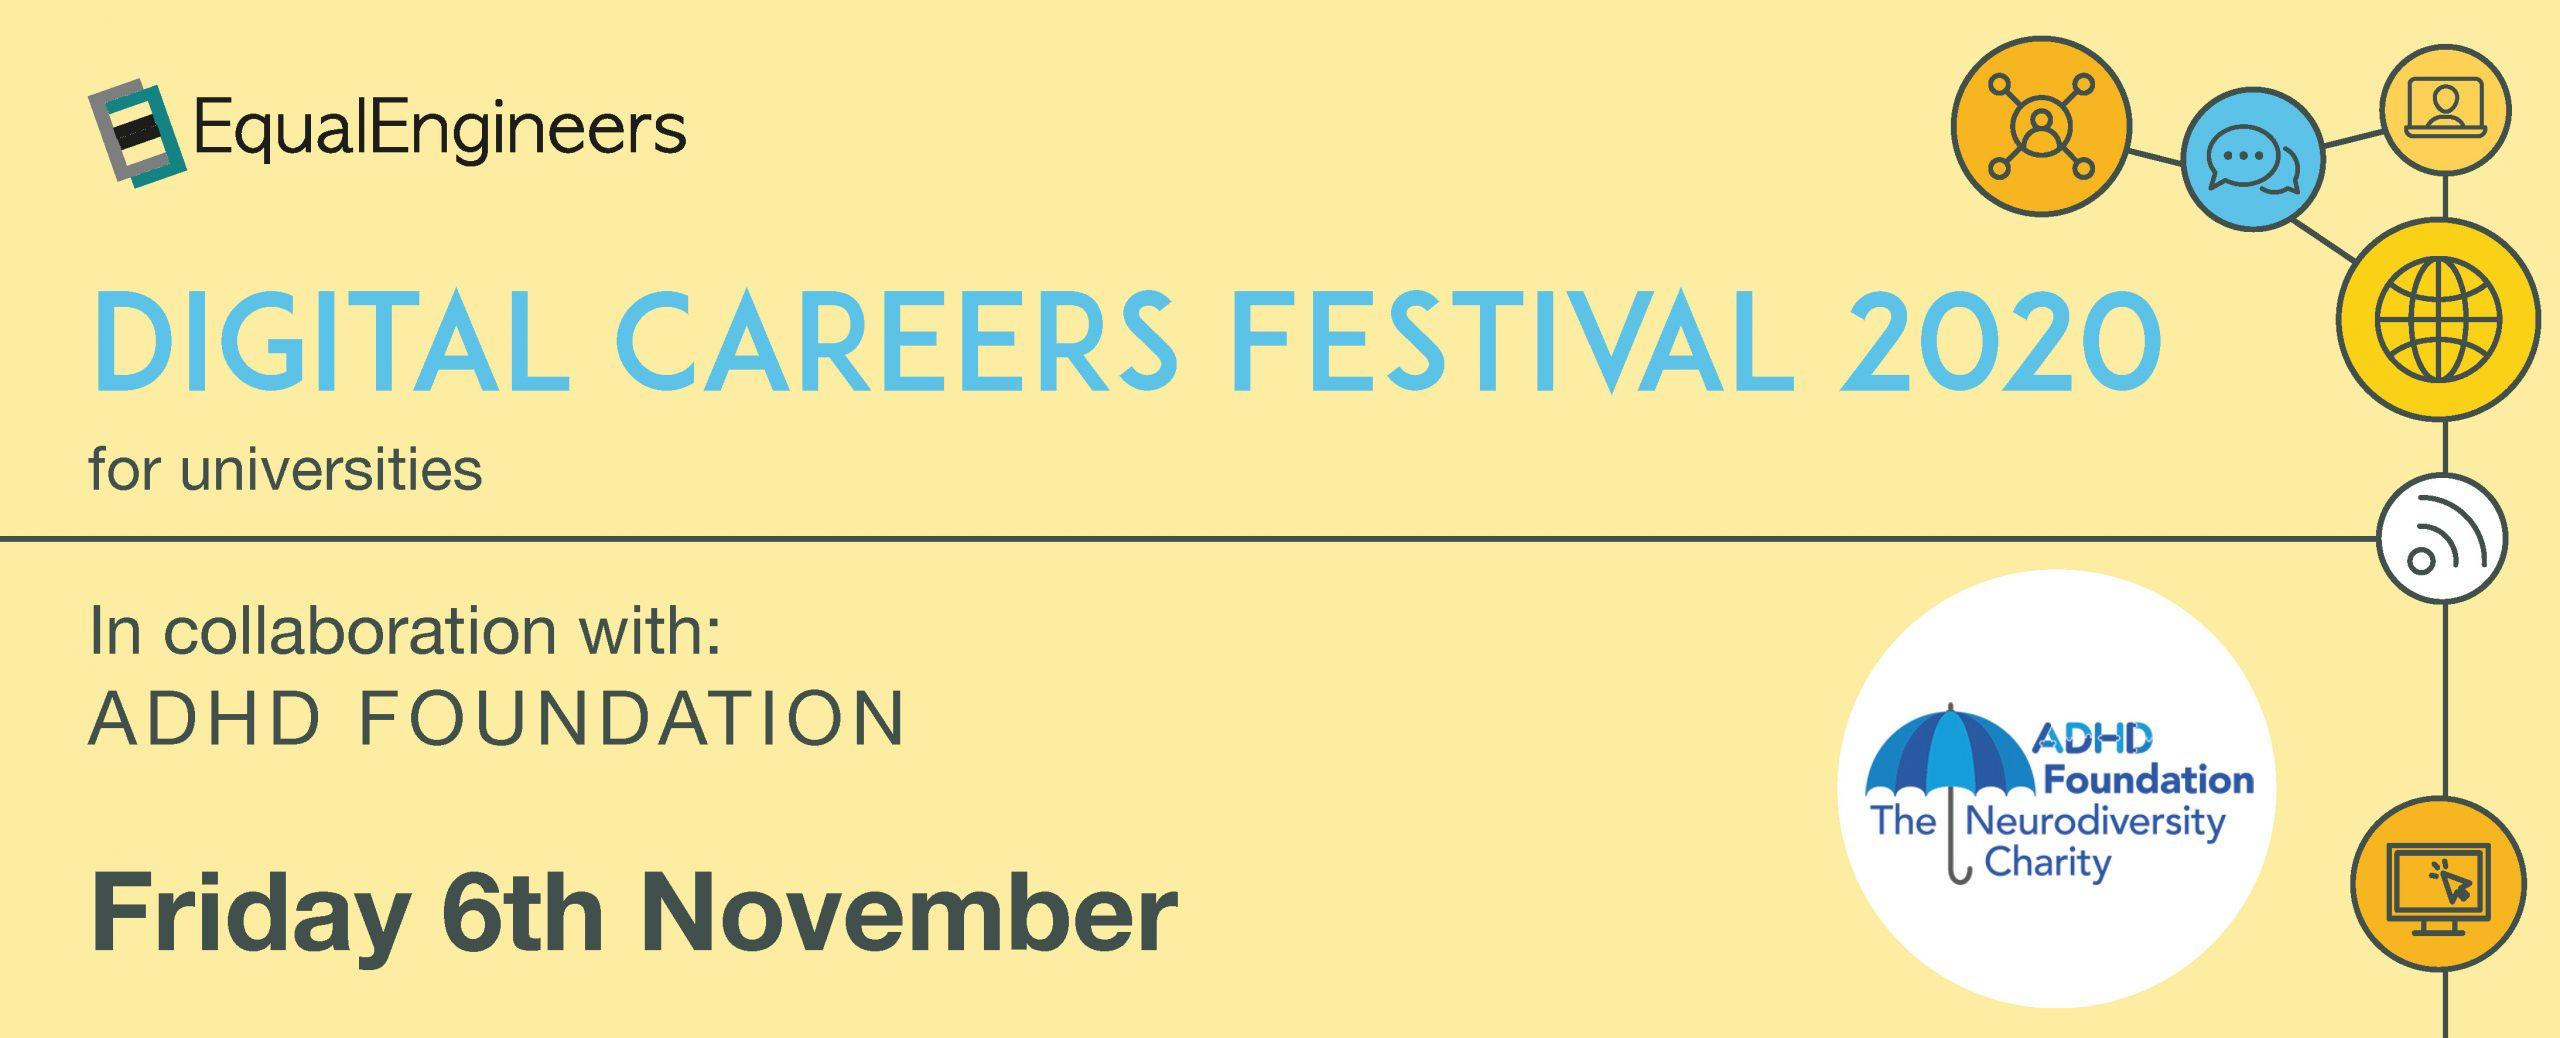 Digital Careers Festival for Universities - 6th November